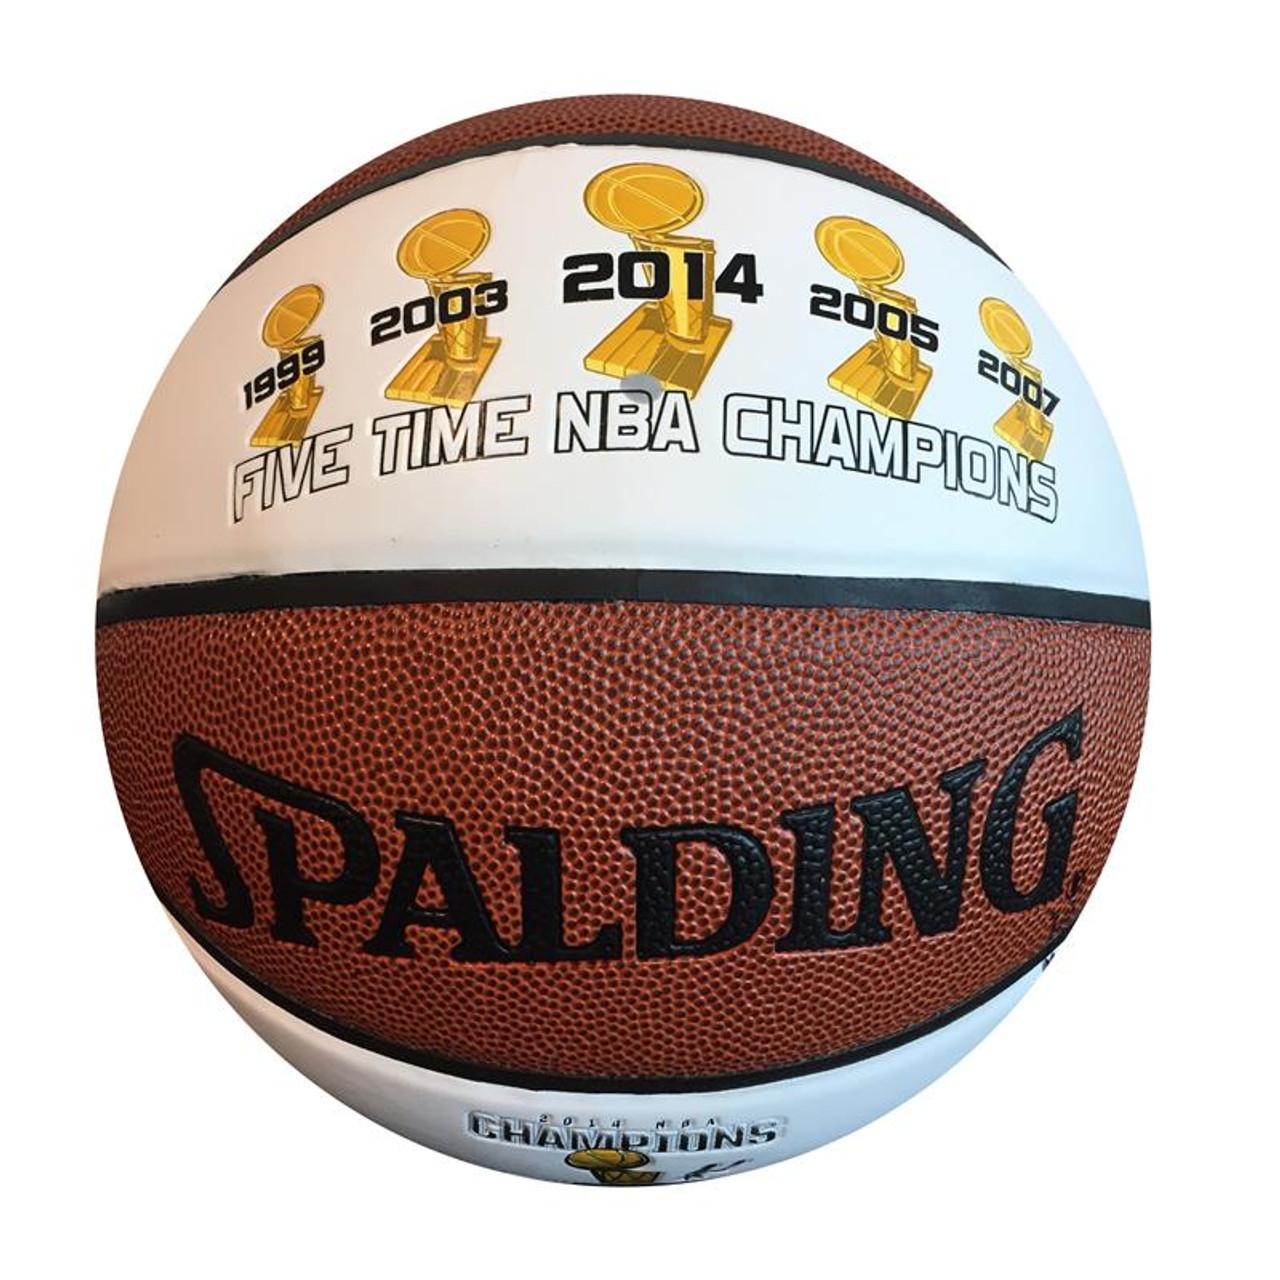 Tony Parker Autographed San Antonio Spurs 2014 NBA Championship Basketball c26f6efde